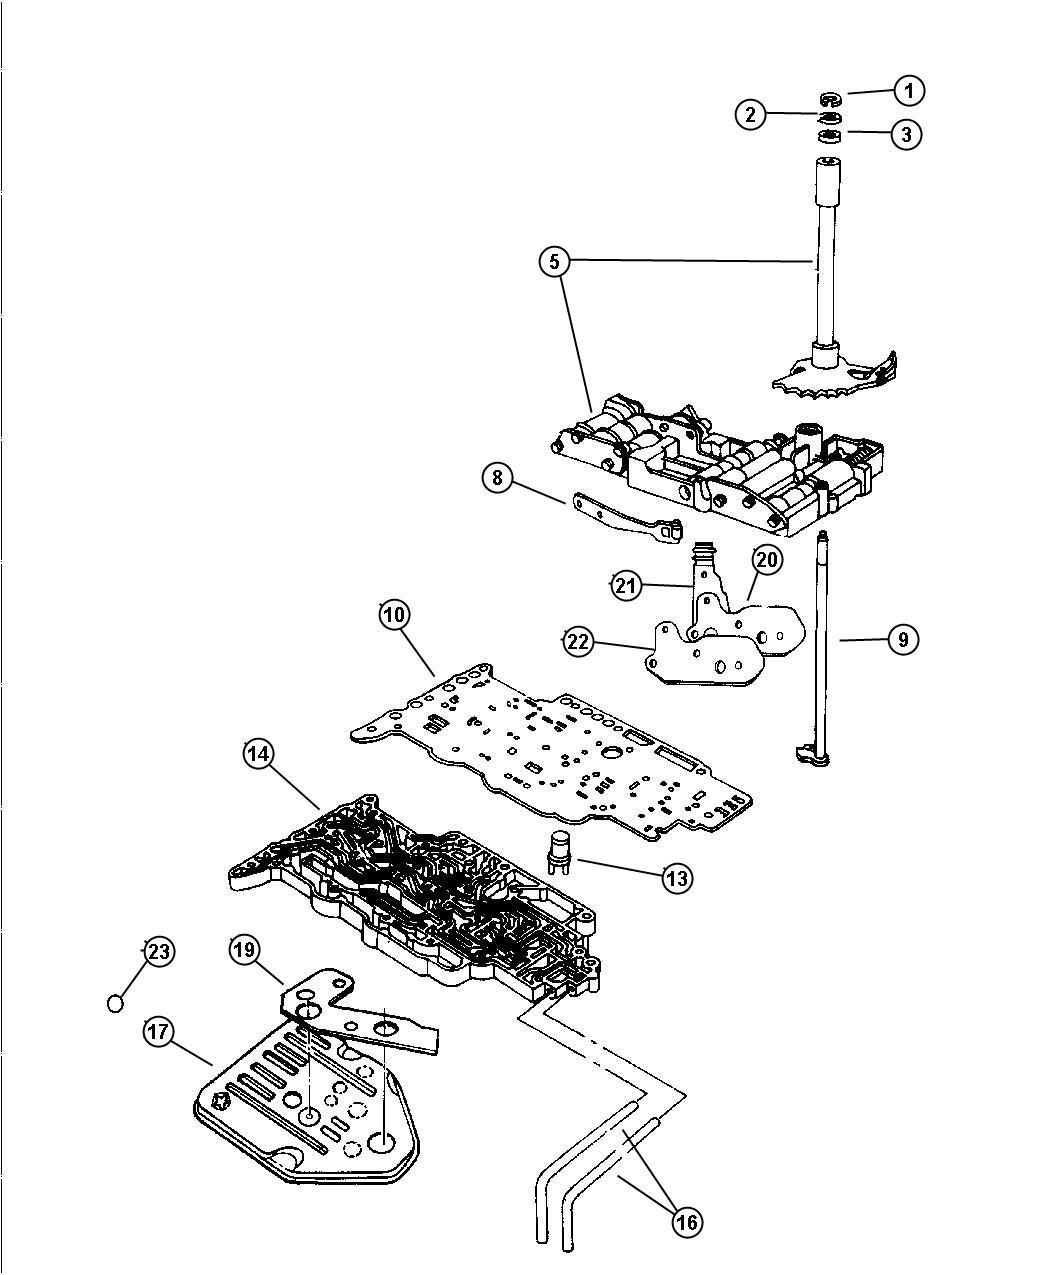 00 mazda protege engine diagram mazda protege exhaust